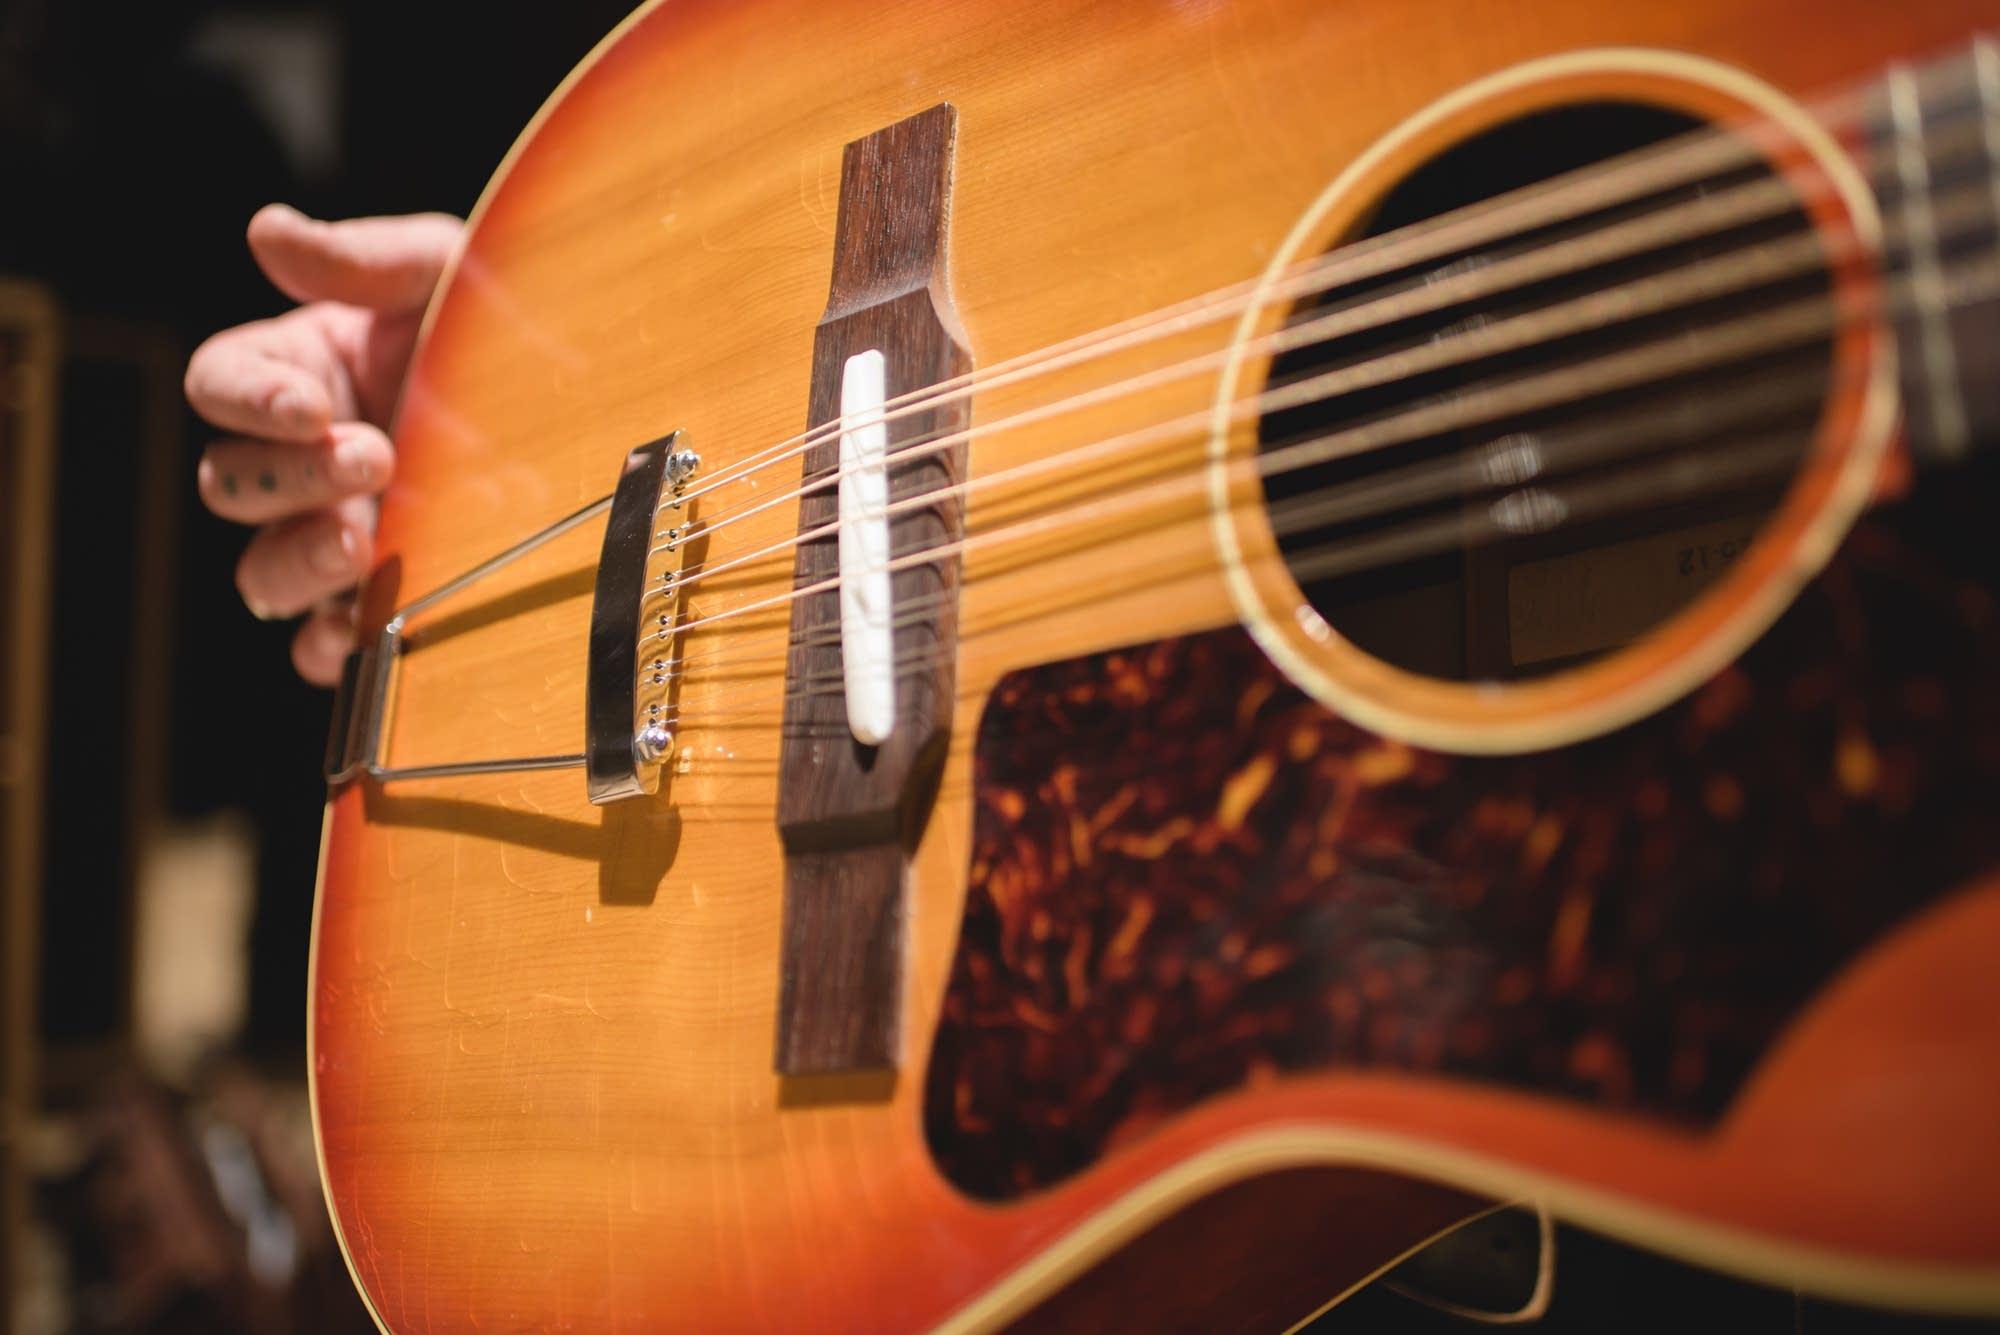 Nathaniel Rateliff, Gibson B-25 12 string 4